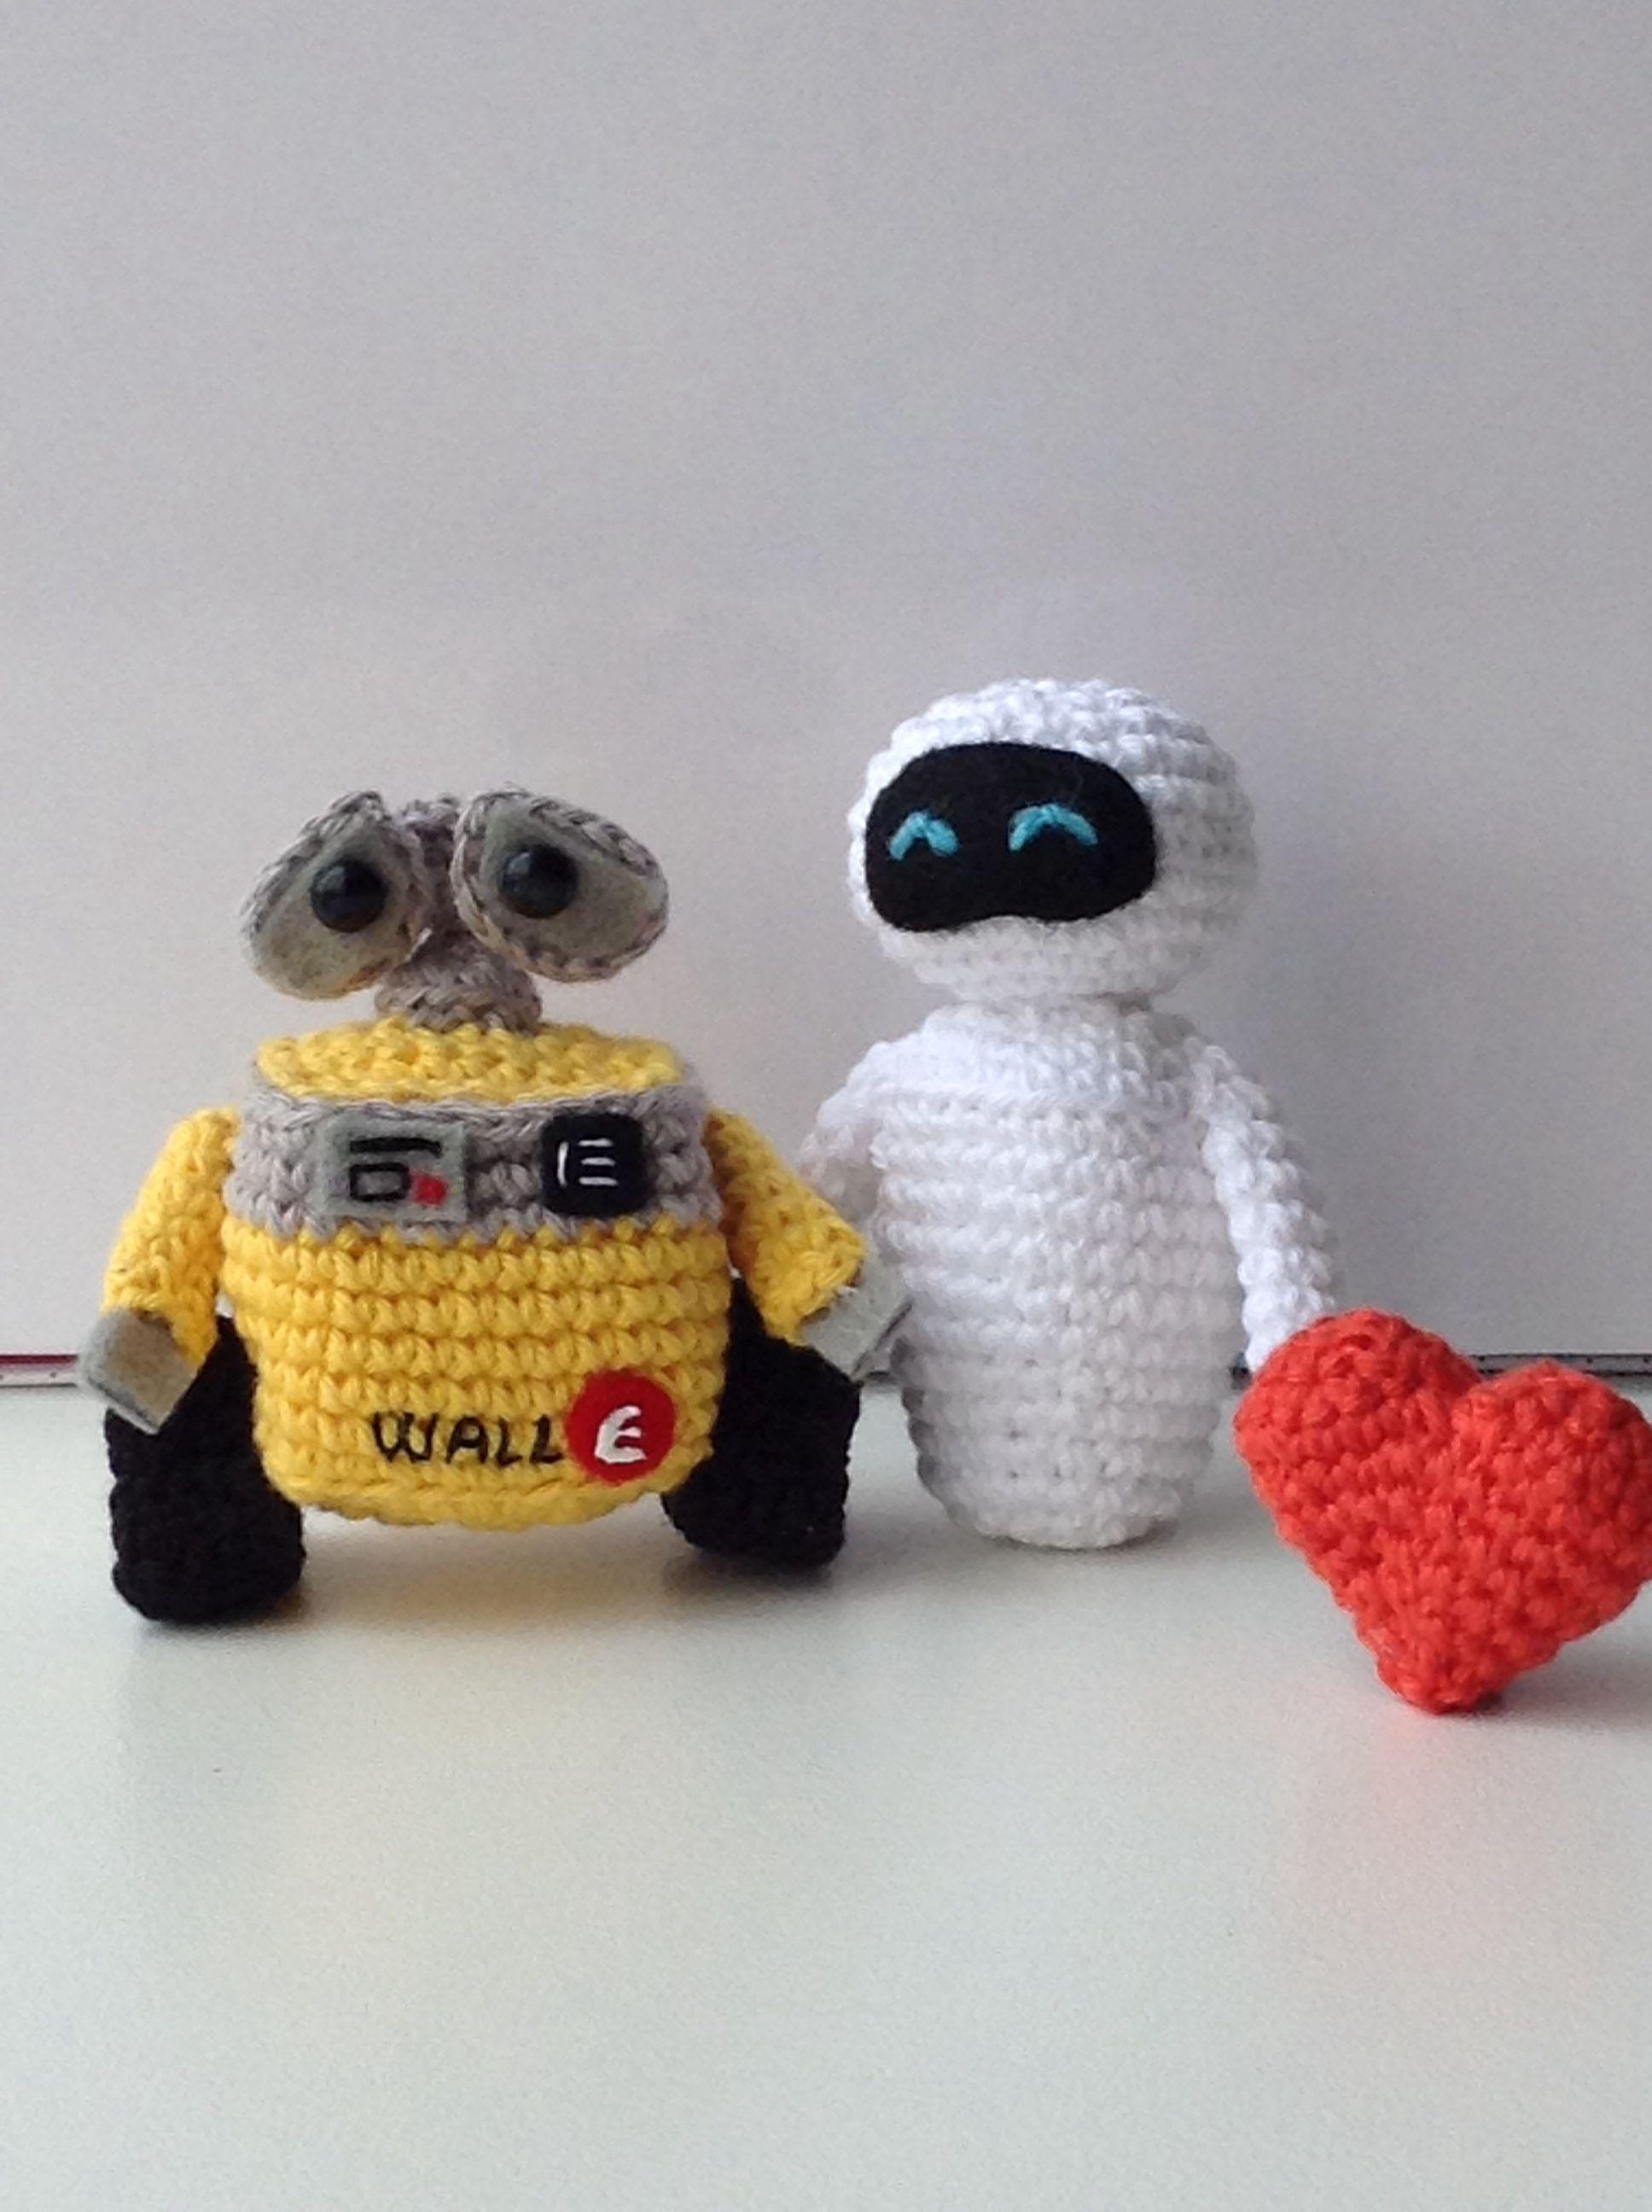 Wall-e & Eva #crochet #amigurumi valentines day. | ANAgurumi ...